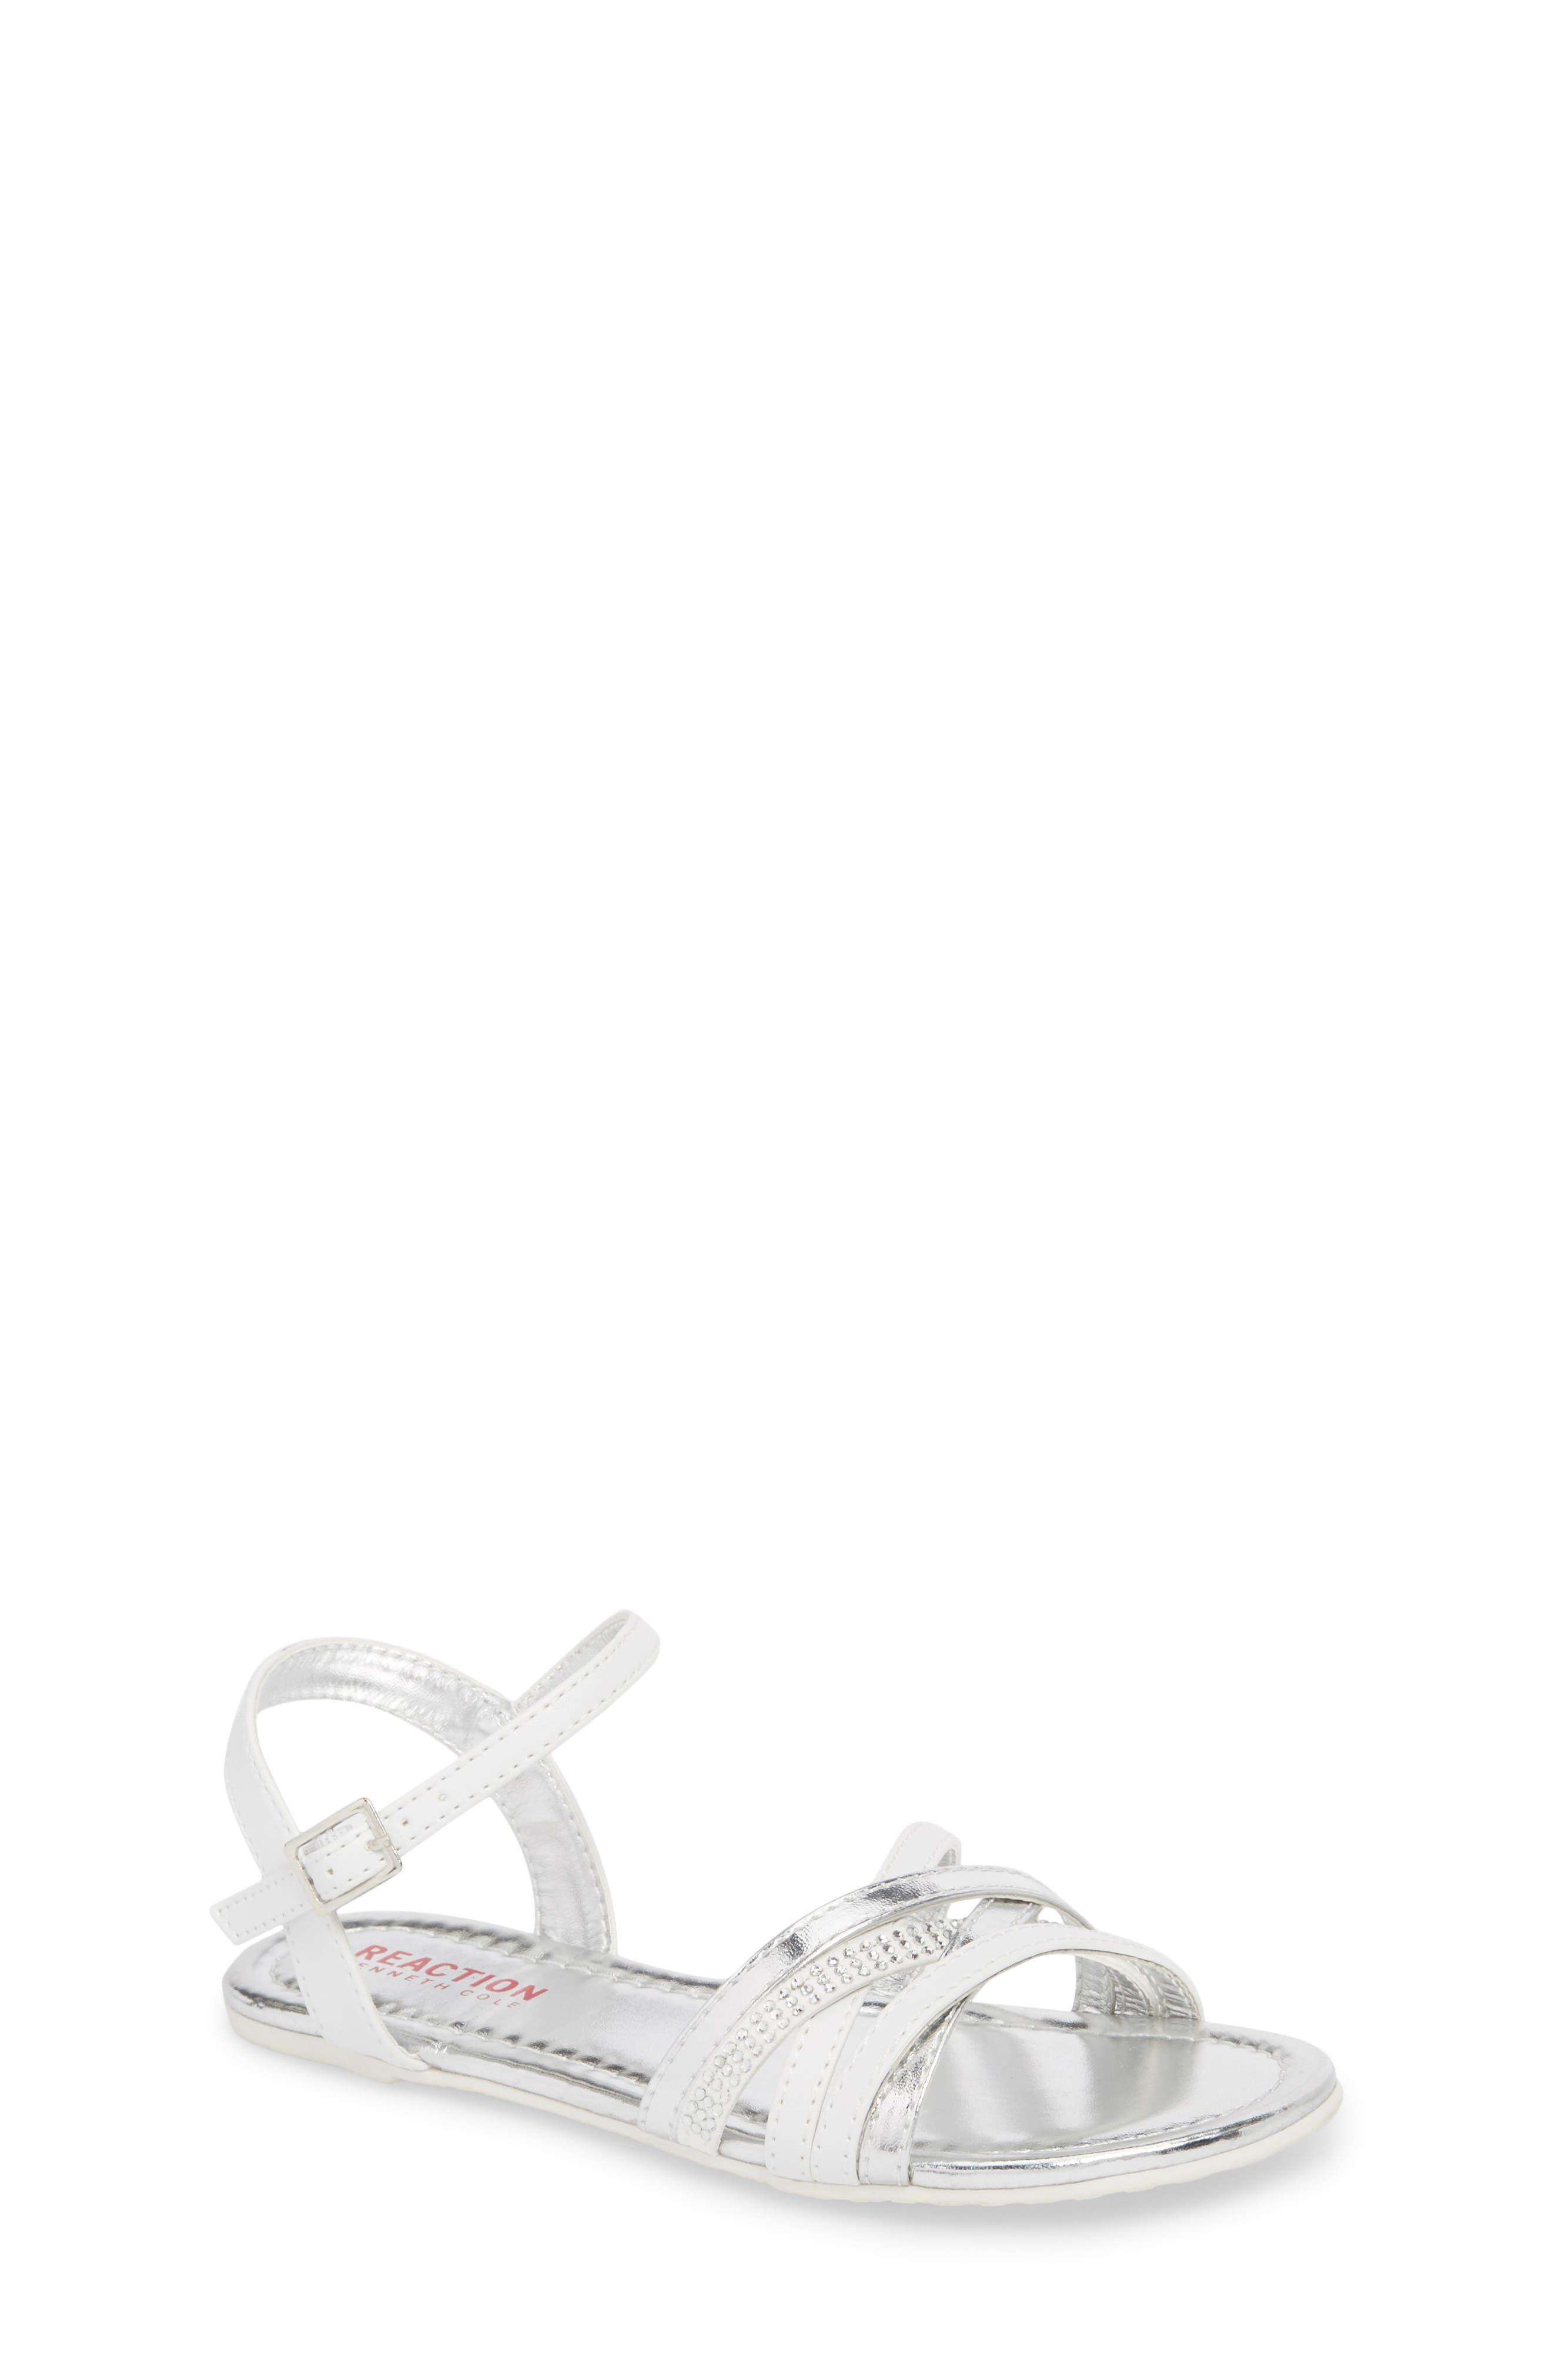 Kiera Getty Crystal Sandal,                             Main thumbnail 1, color,                             White